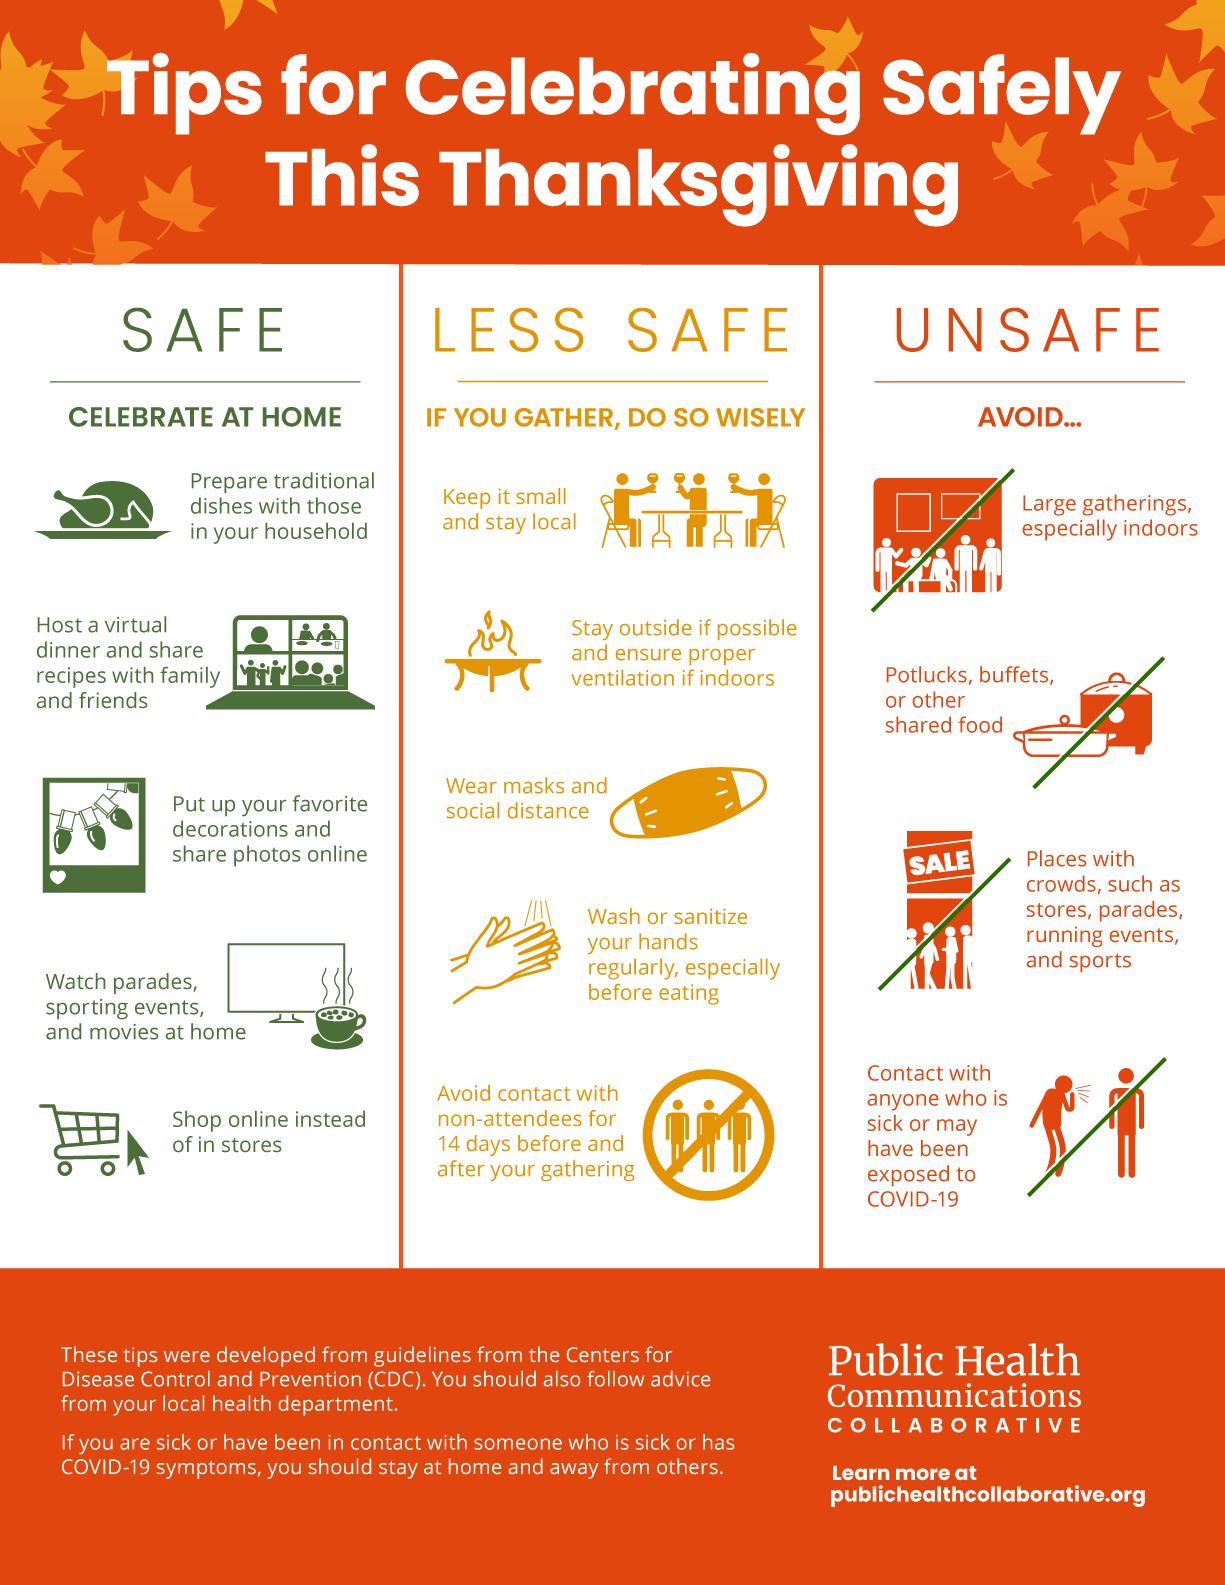 Tips for Celebrating Safely